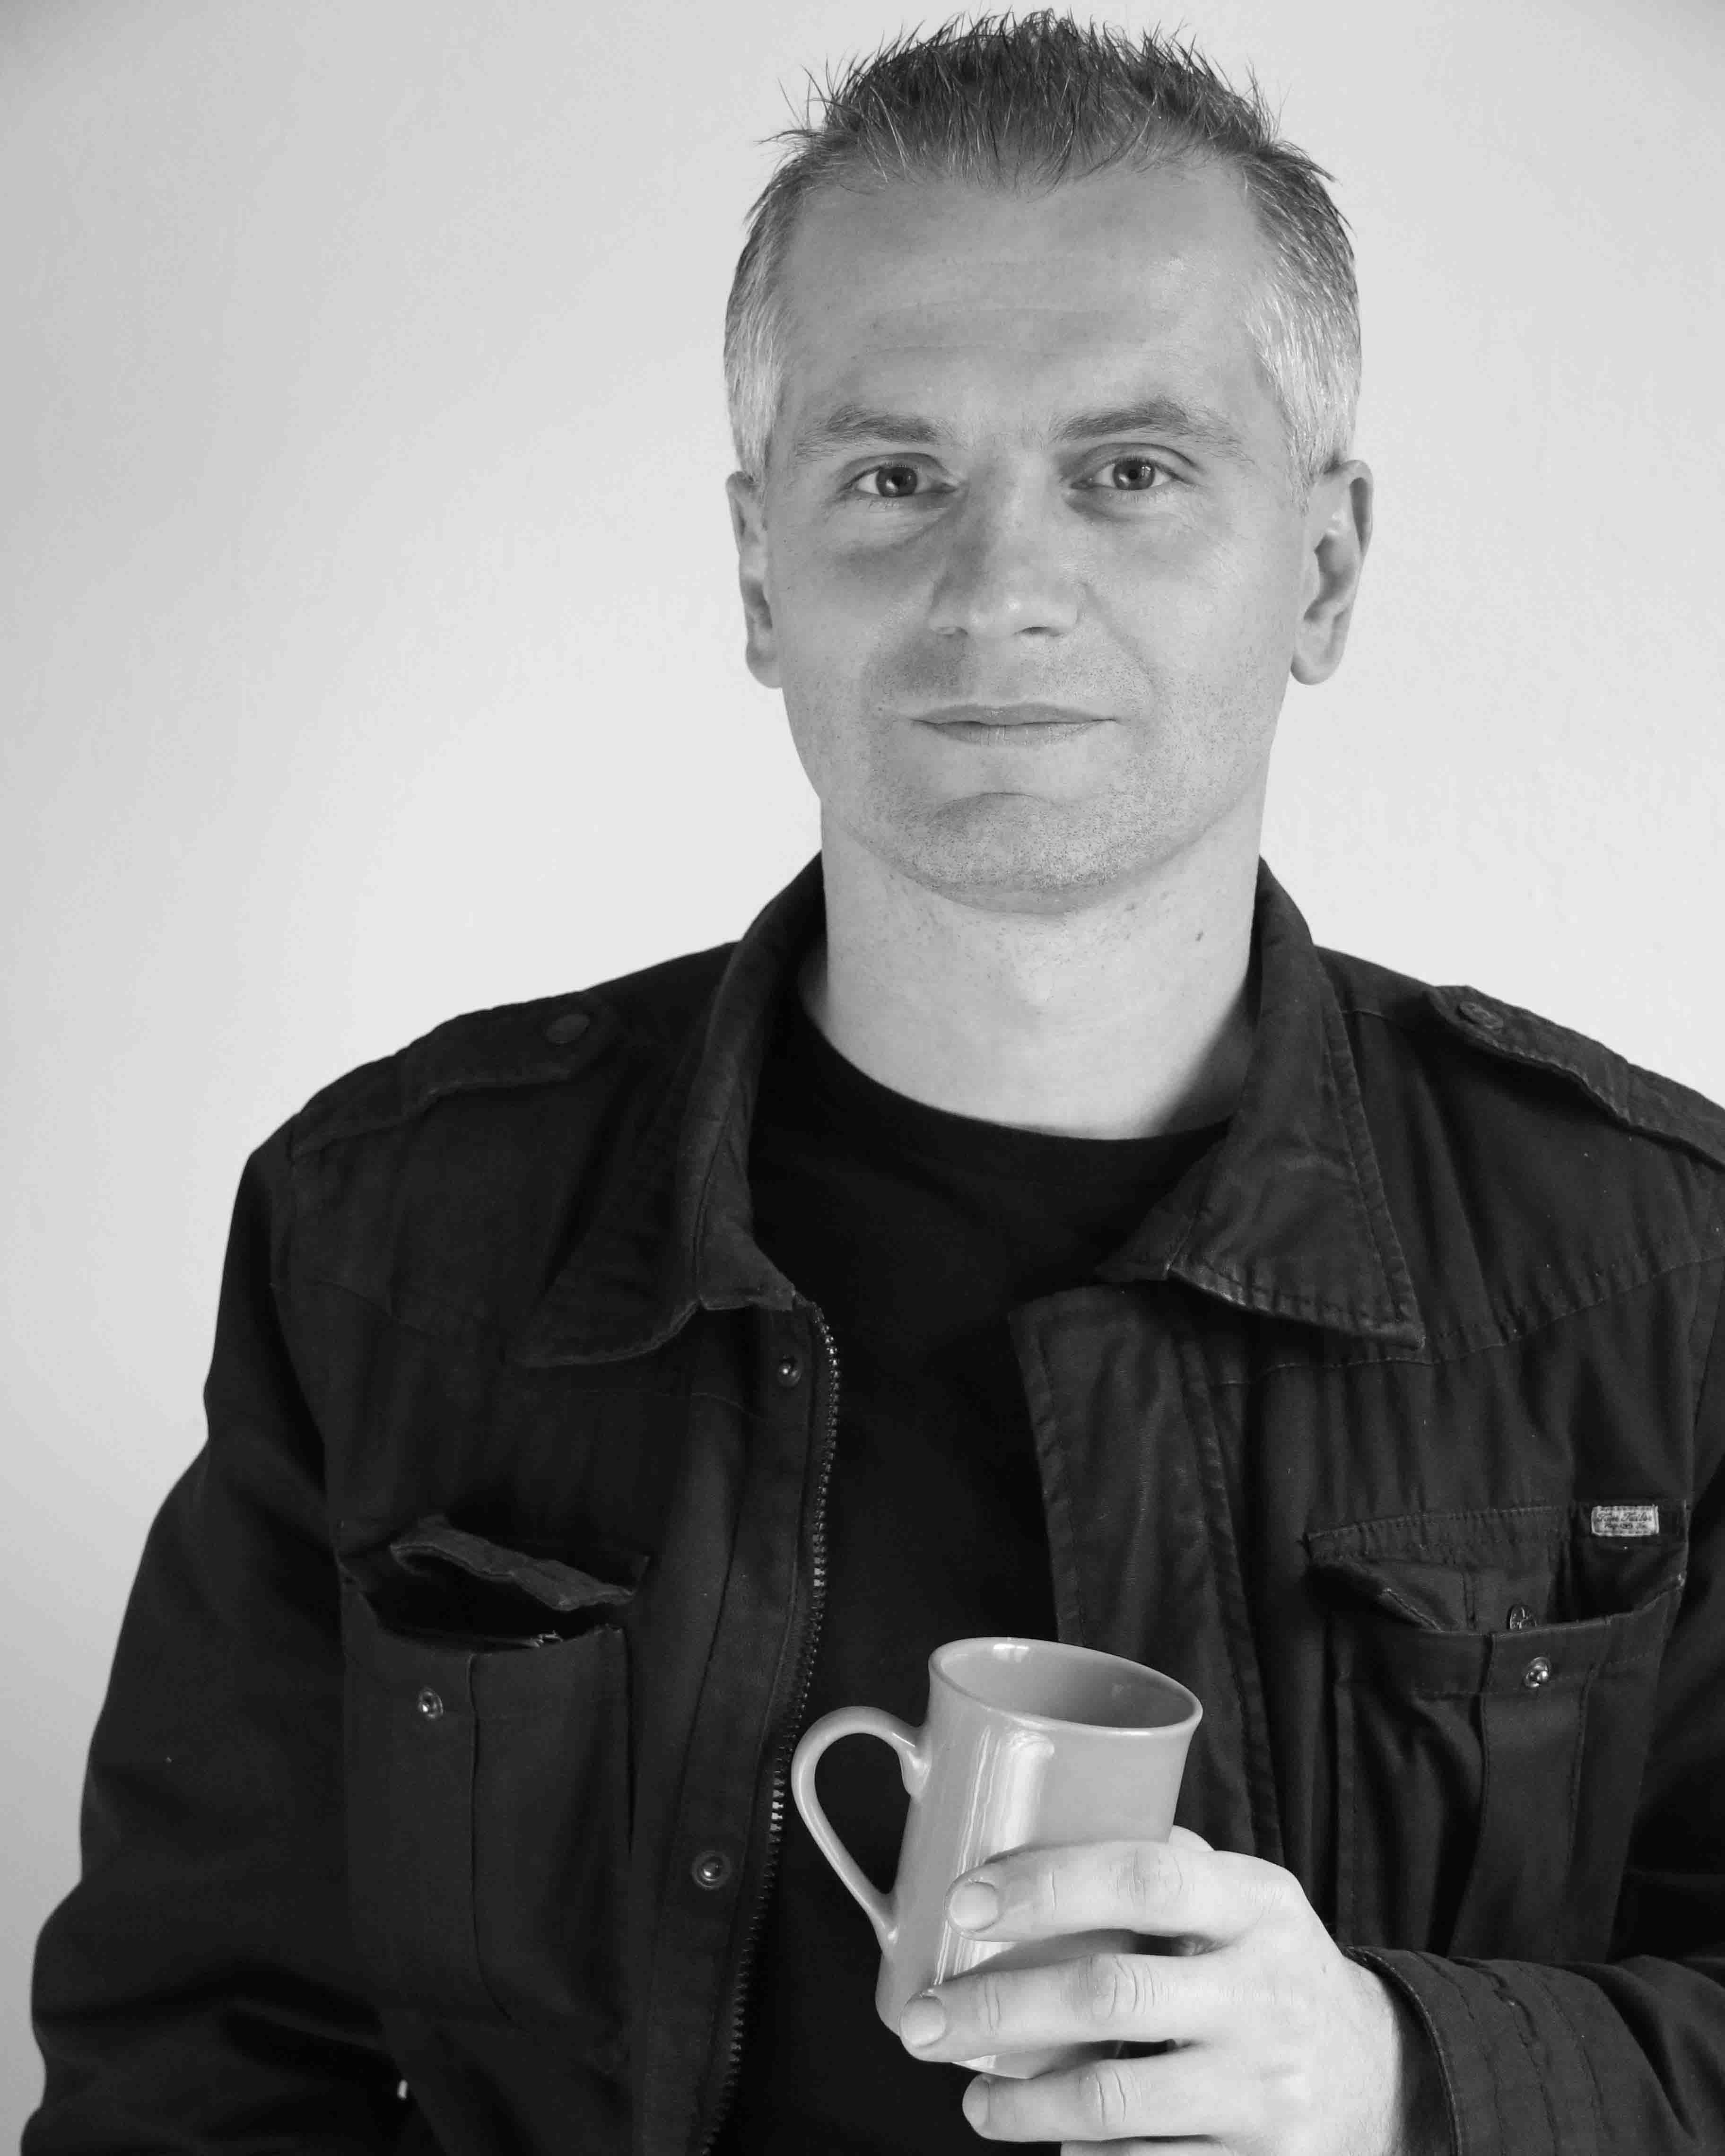 Daniel Skibinski